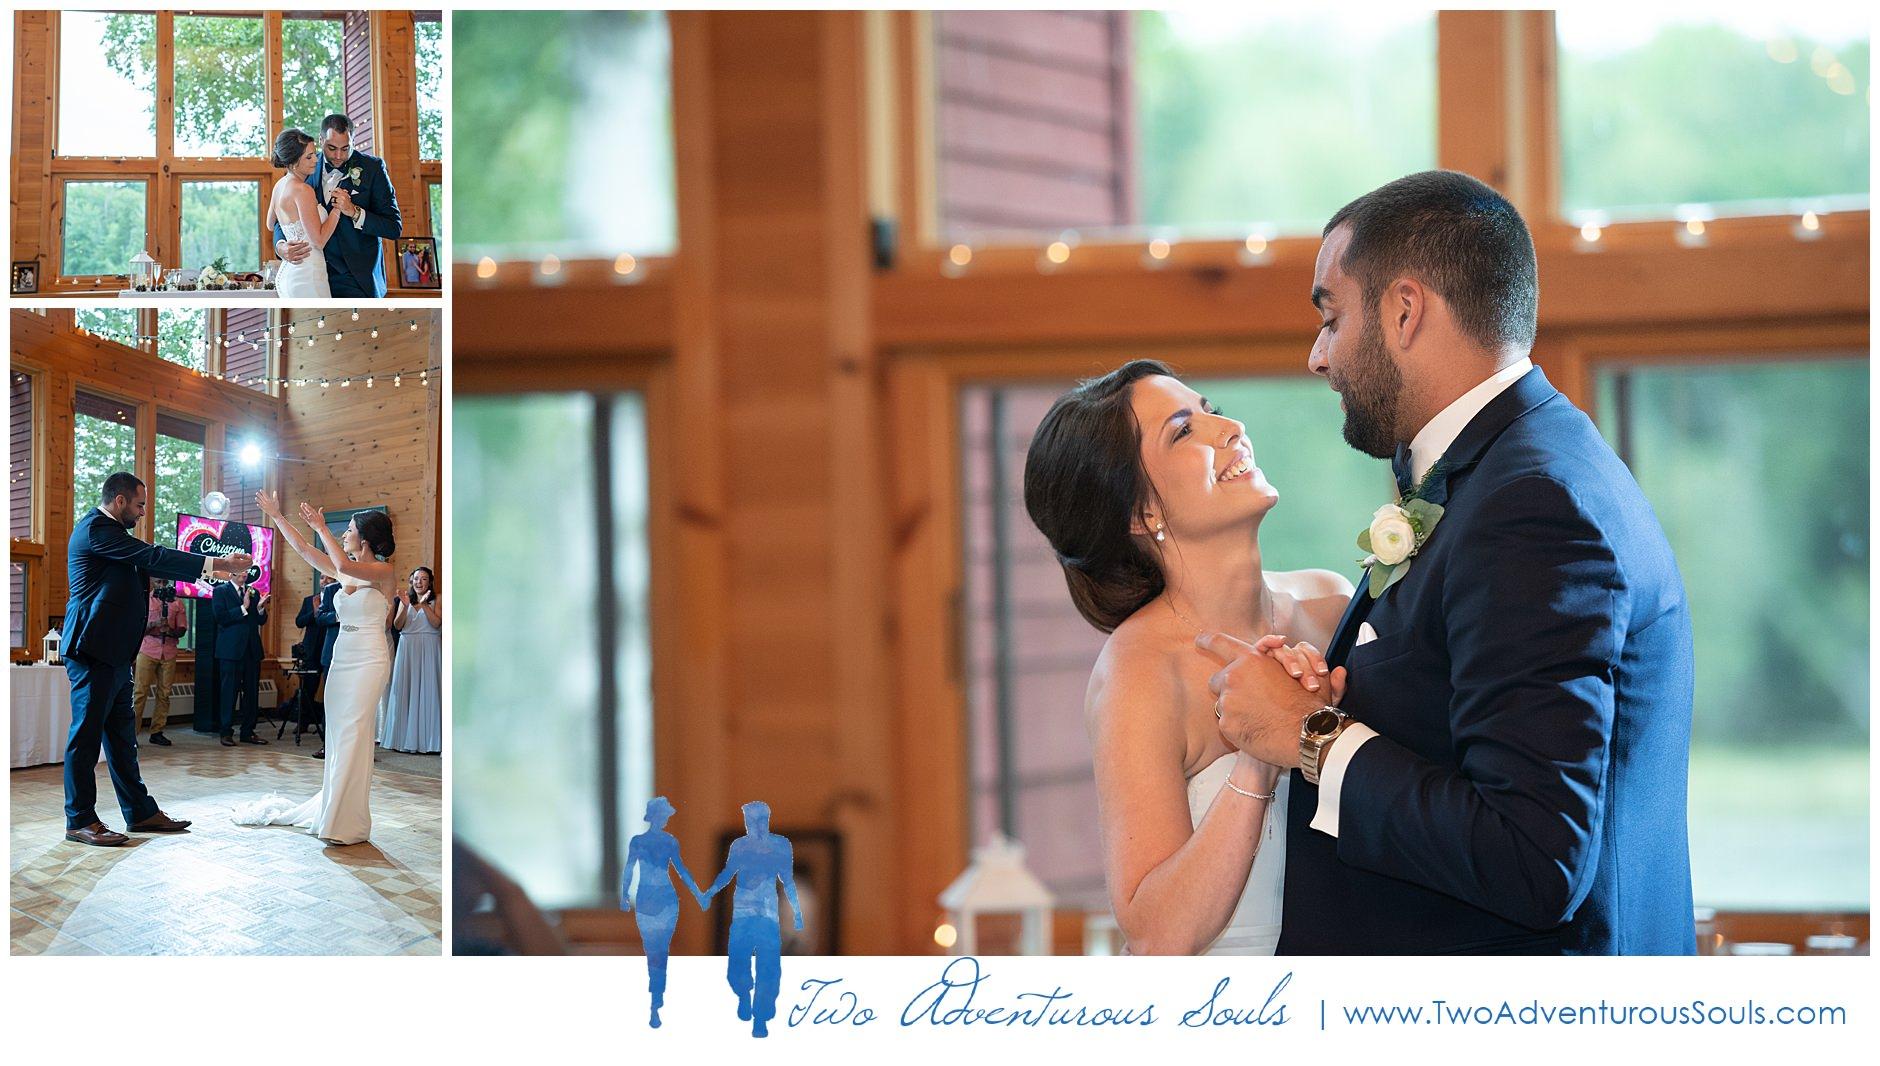 Sugarloaf Outdoor Center Wedding Photographers, Destination Wedding Photographers, Two Adventurous Souls-081719_0053.jpg